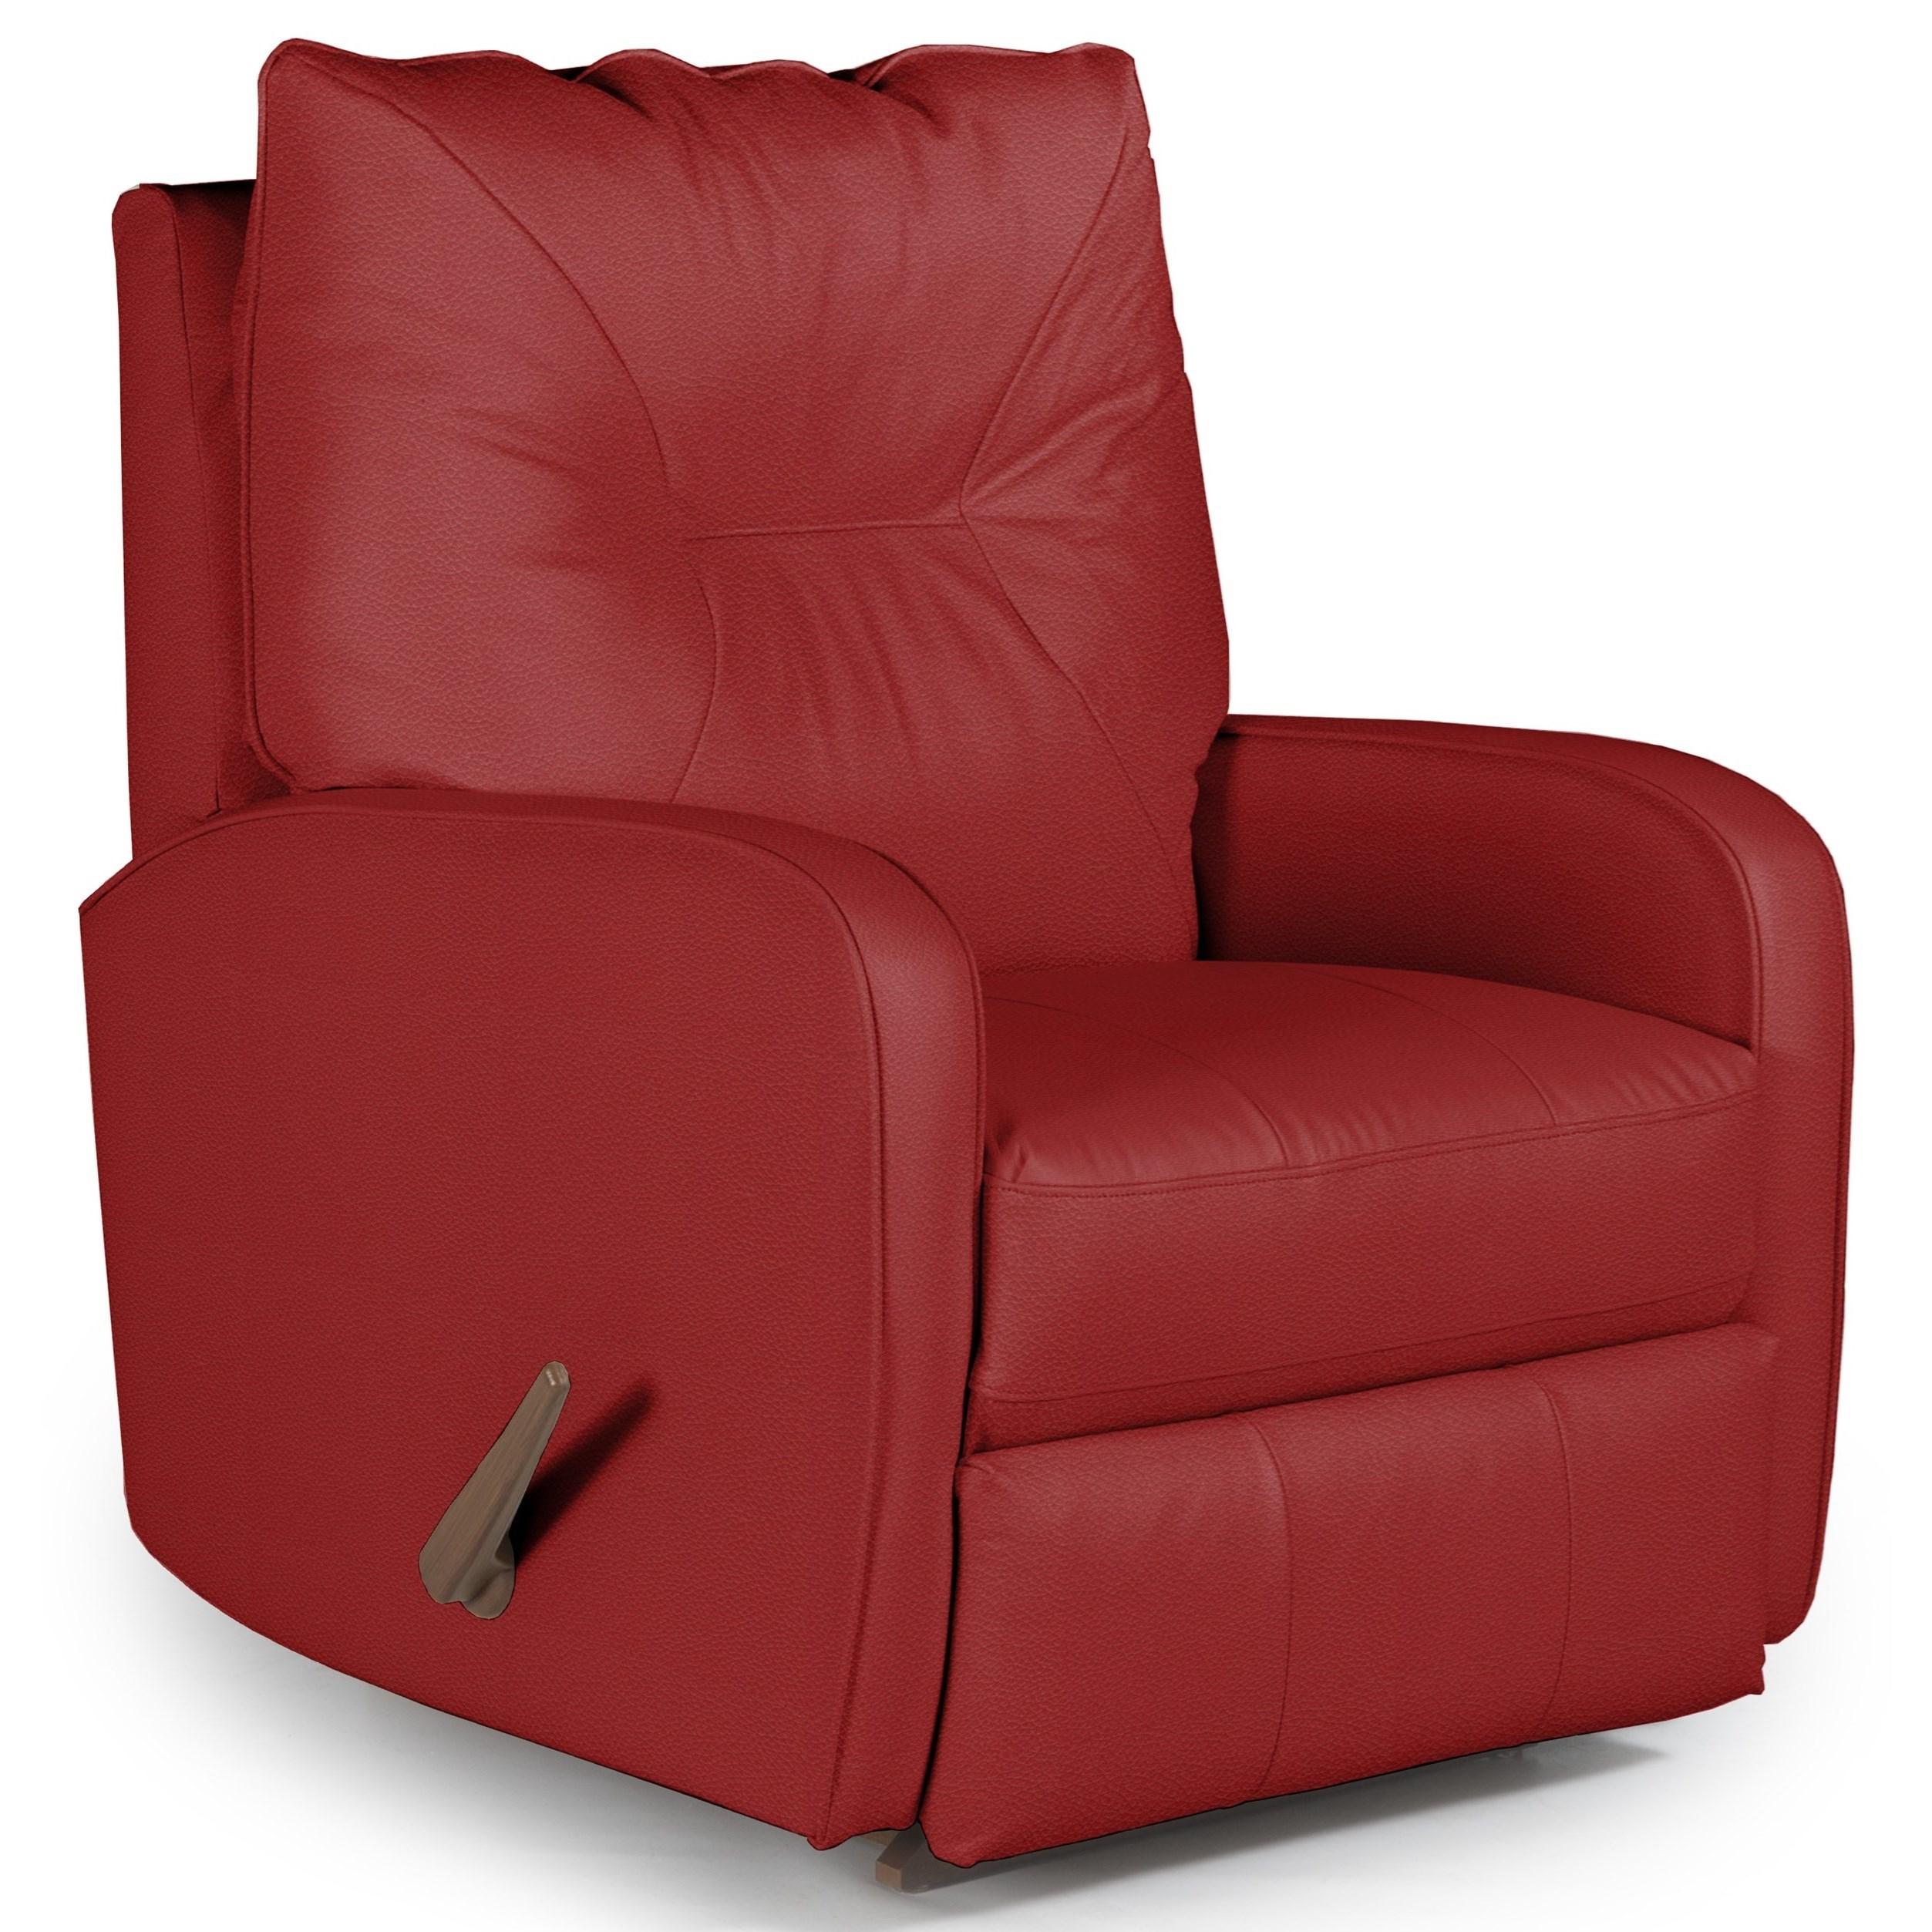 Best Home Furnishings Recliners - Medium Ingall Rocker Recliner - Item Number: -1473730526-24628U